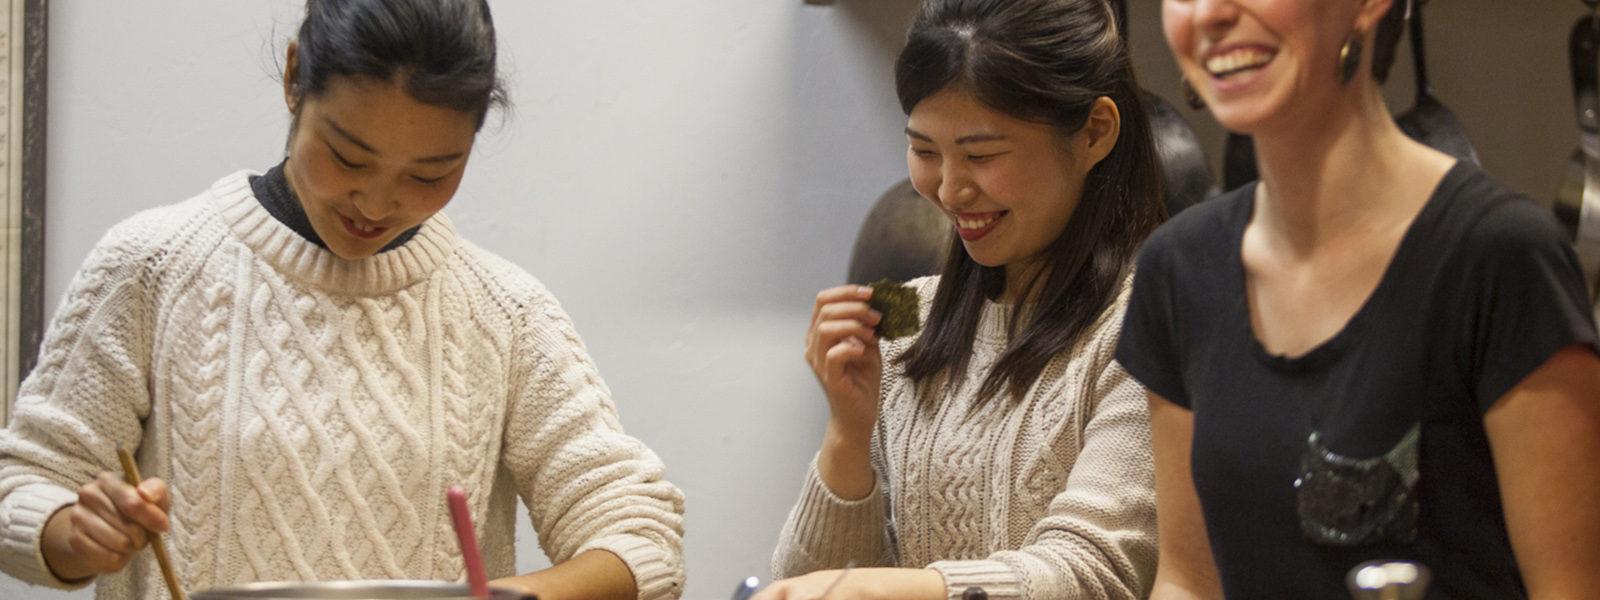 Northland College Japanese exchange students share a laugh with Northland College alumnus Liz Windett